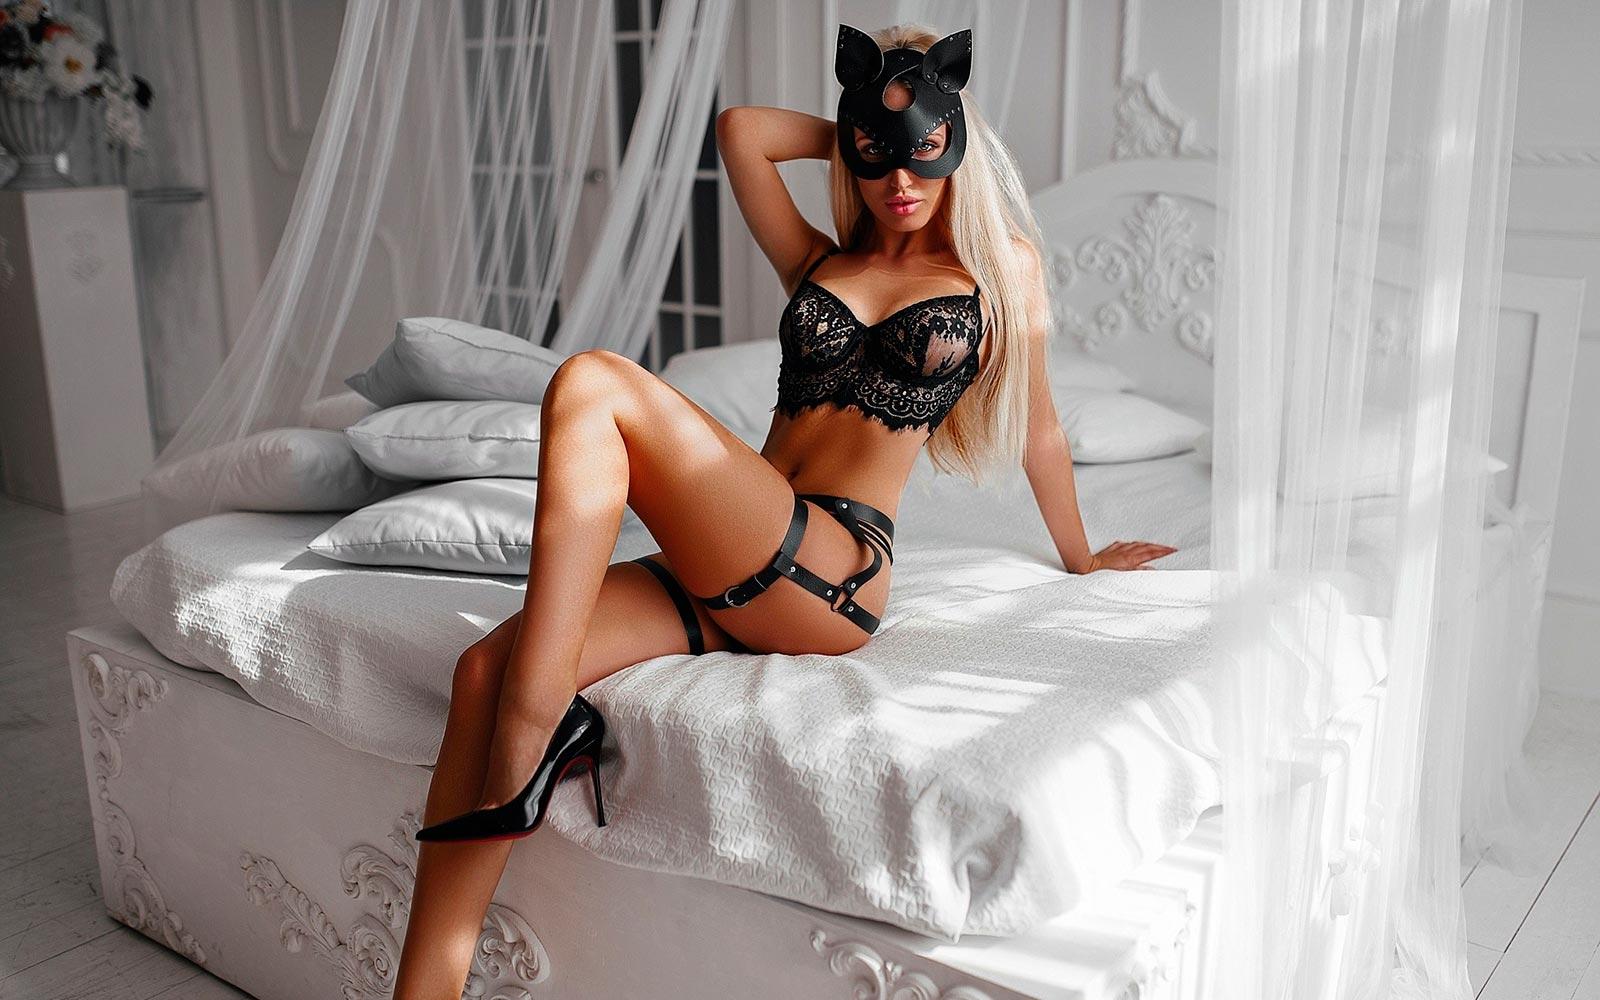 faire un massage erotique massages erotics